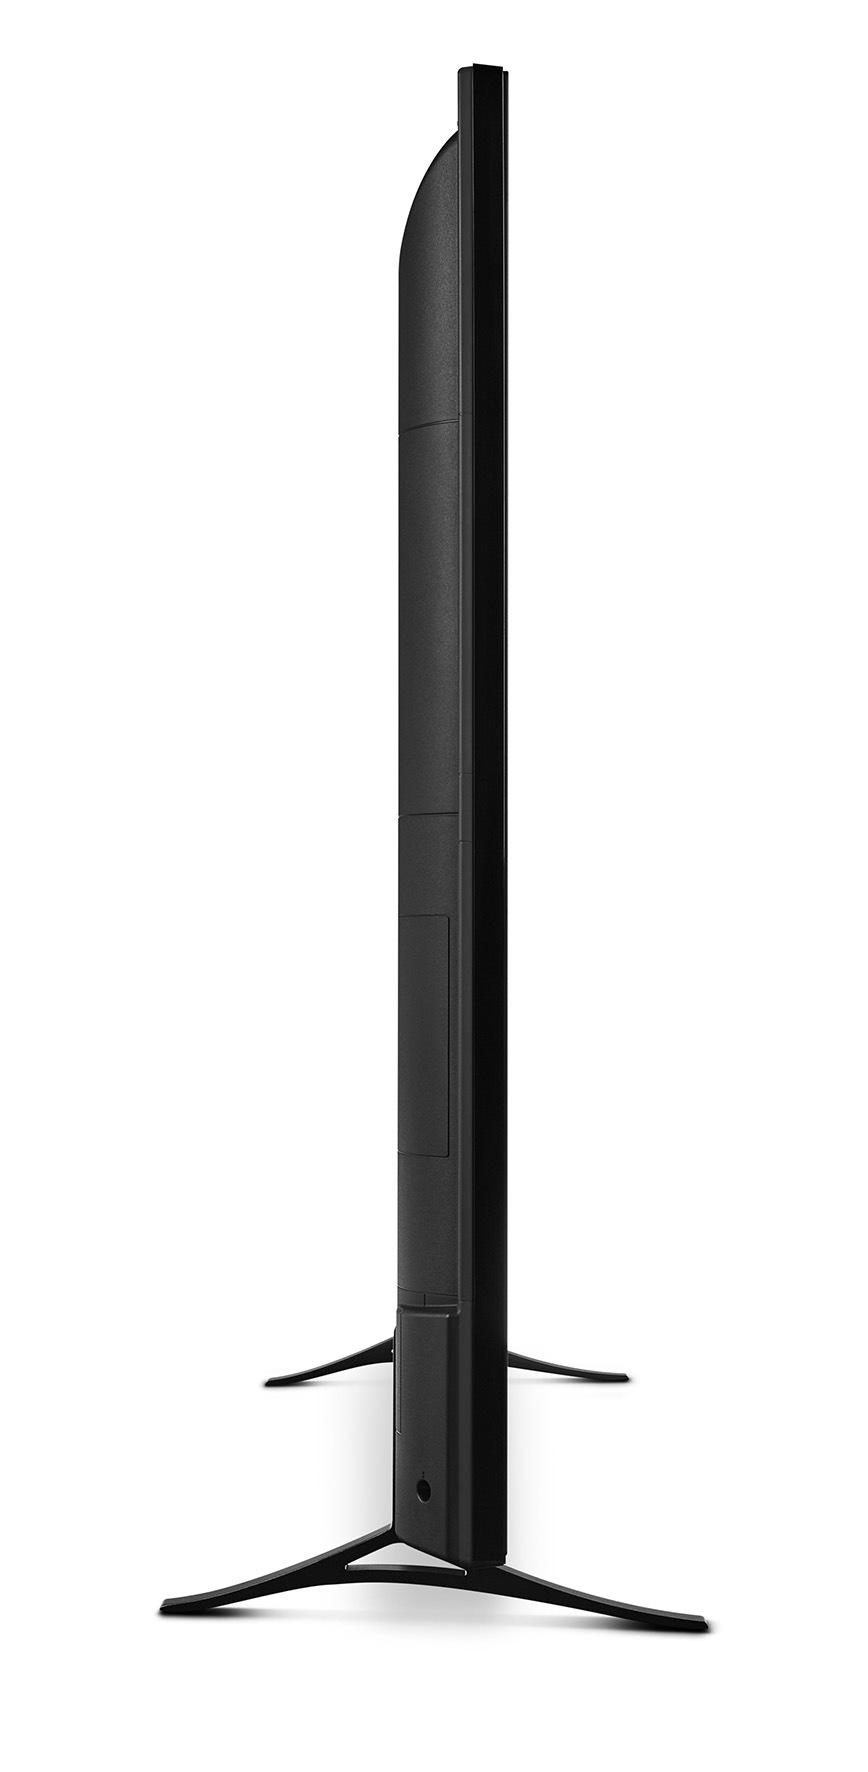 aldi fernseher medion life x18175 mit 75 zoll f r. Black Bedroom Furniture Sets. Home Design Ideas